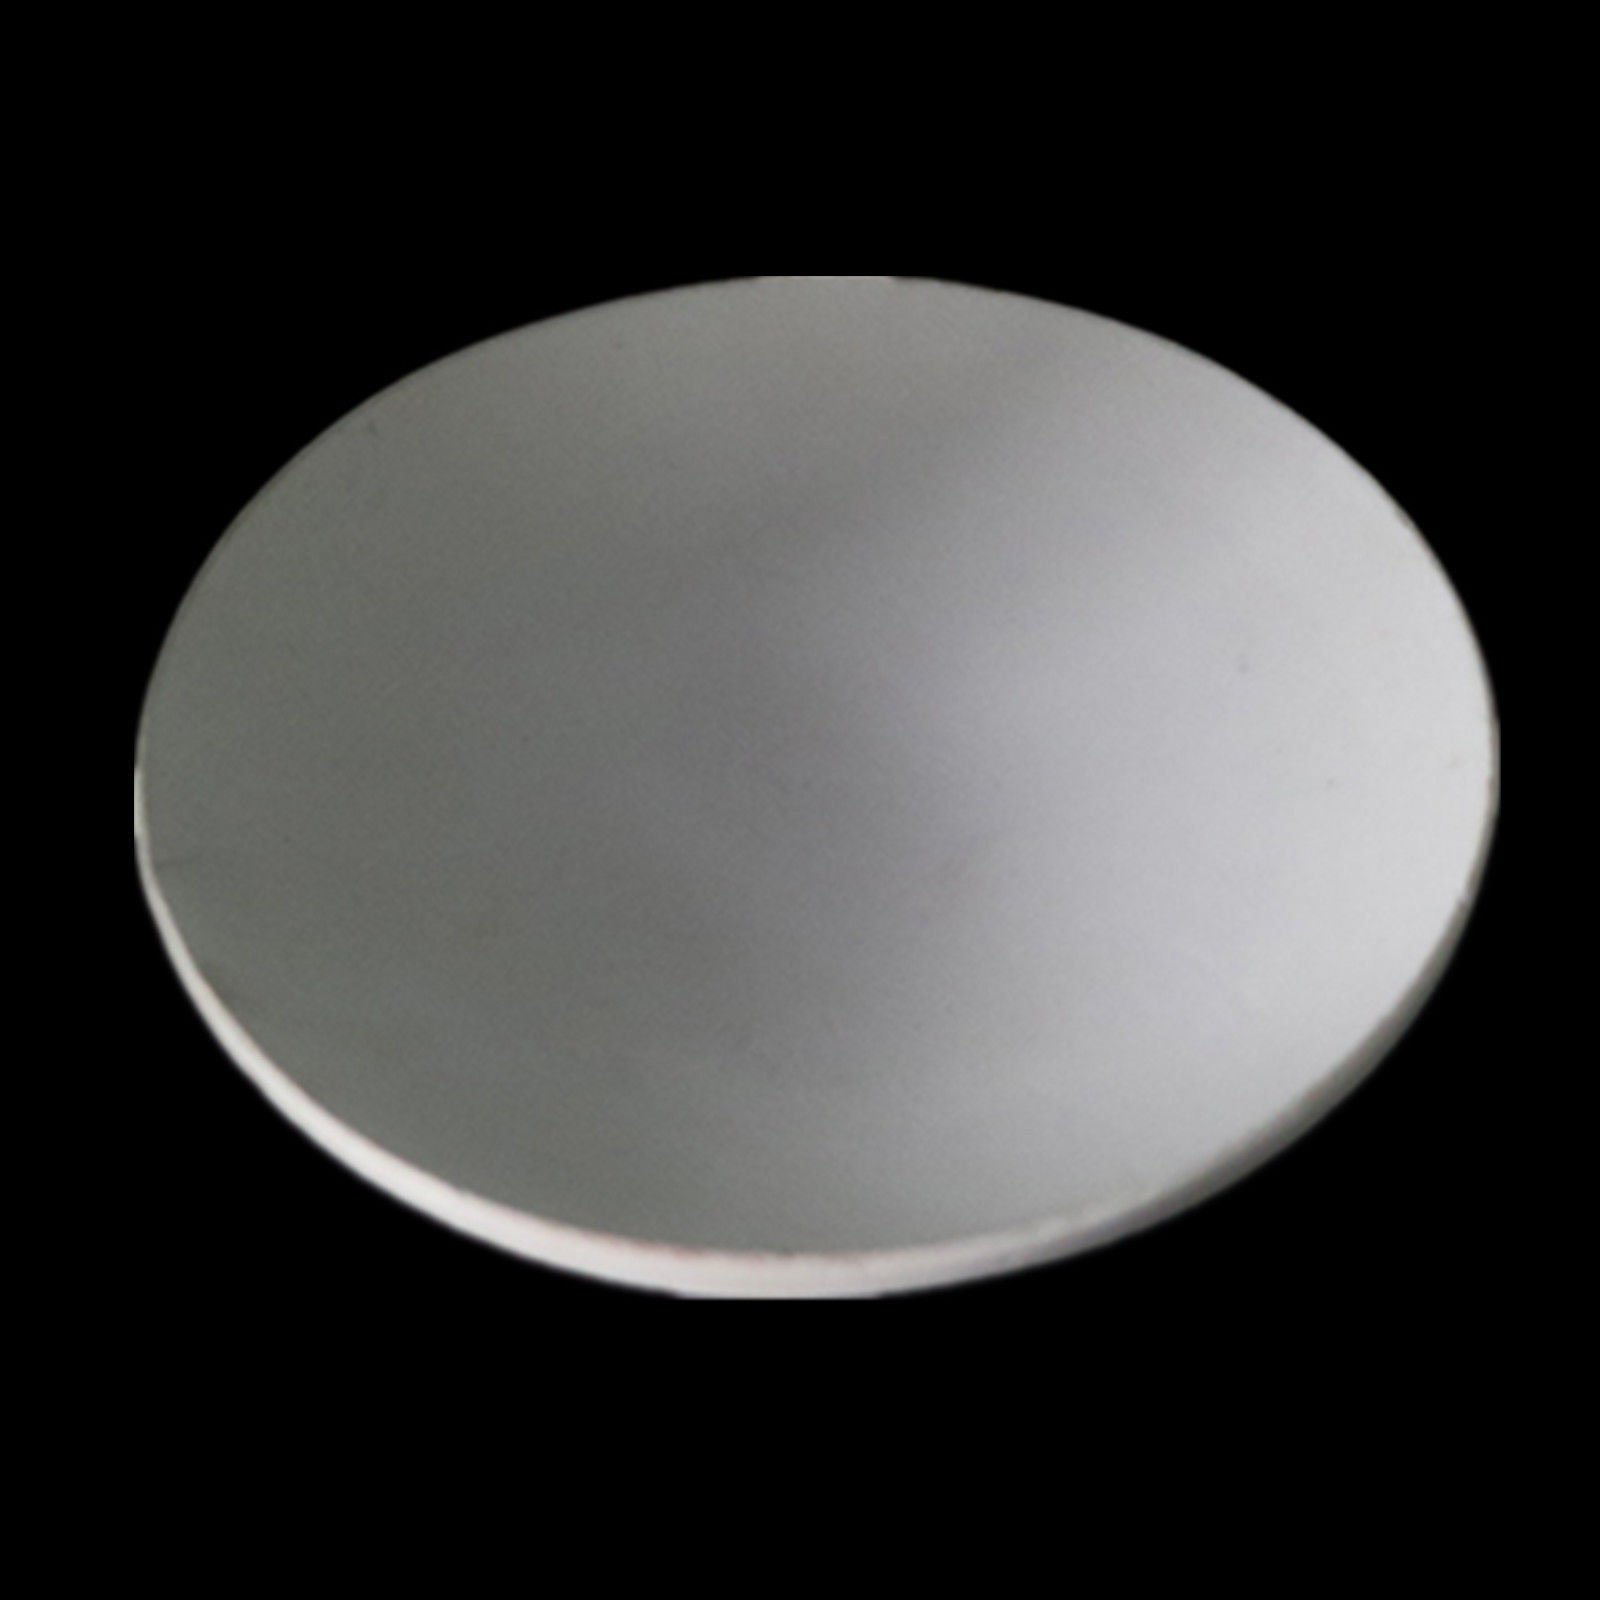 Deschem 100mm,Laboratory PTFE Watch Dish,Surface Dishes,Diameter=10cm